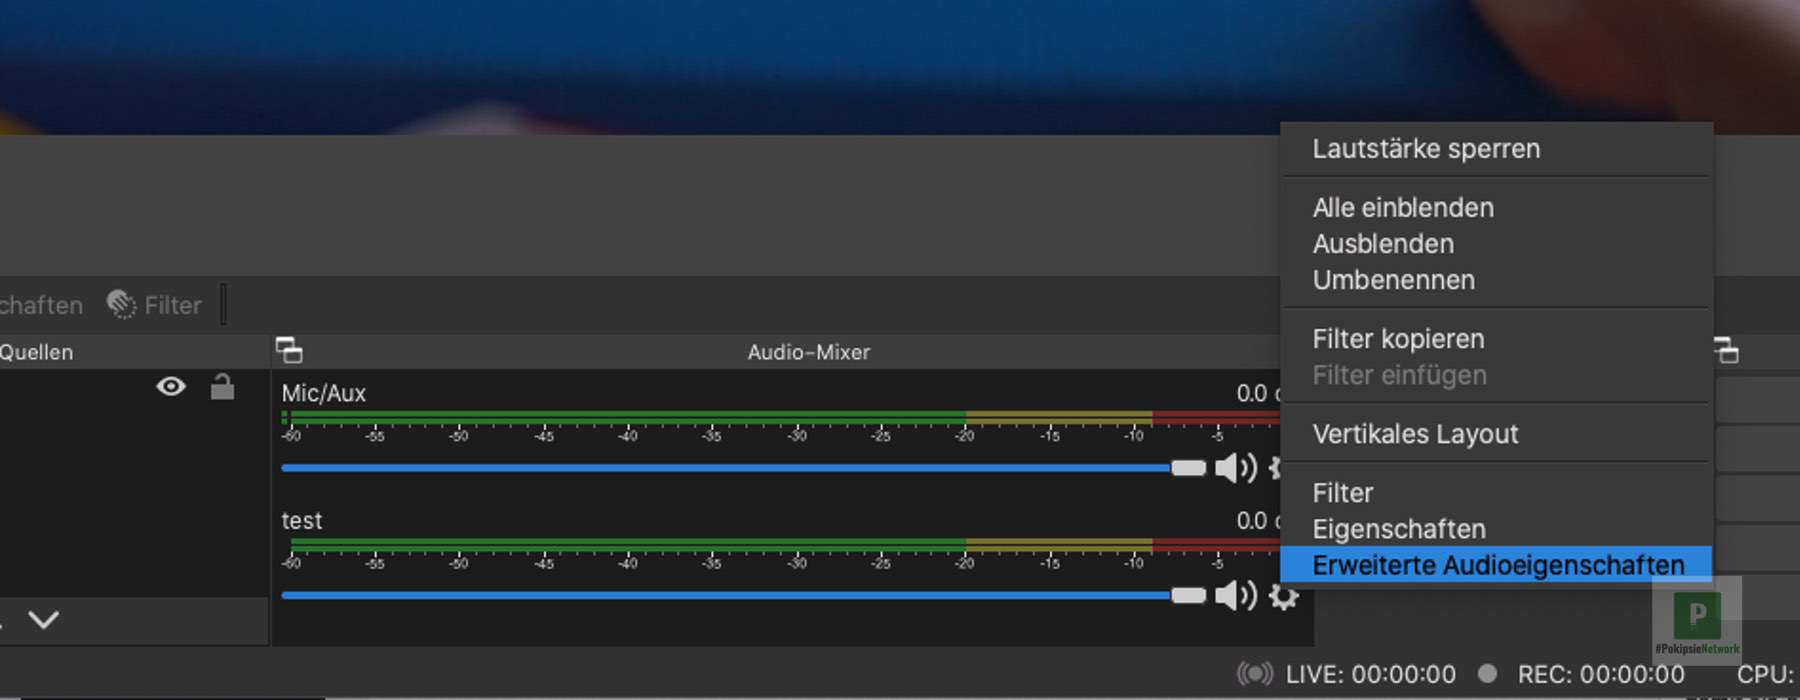 OBS - Erweiterte Audioeigenschaften